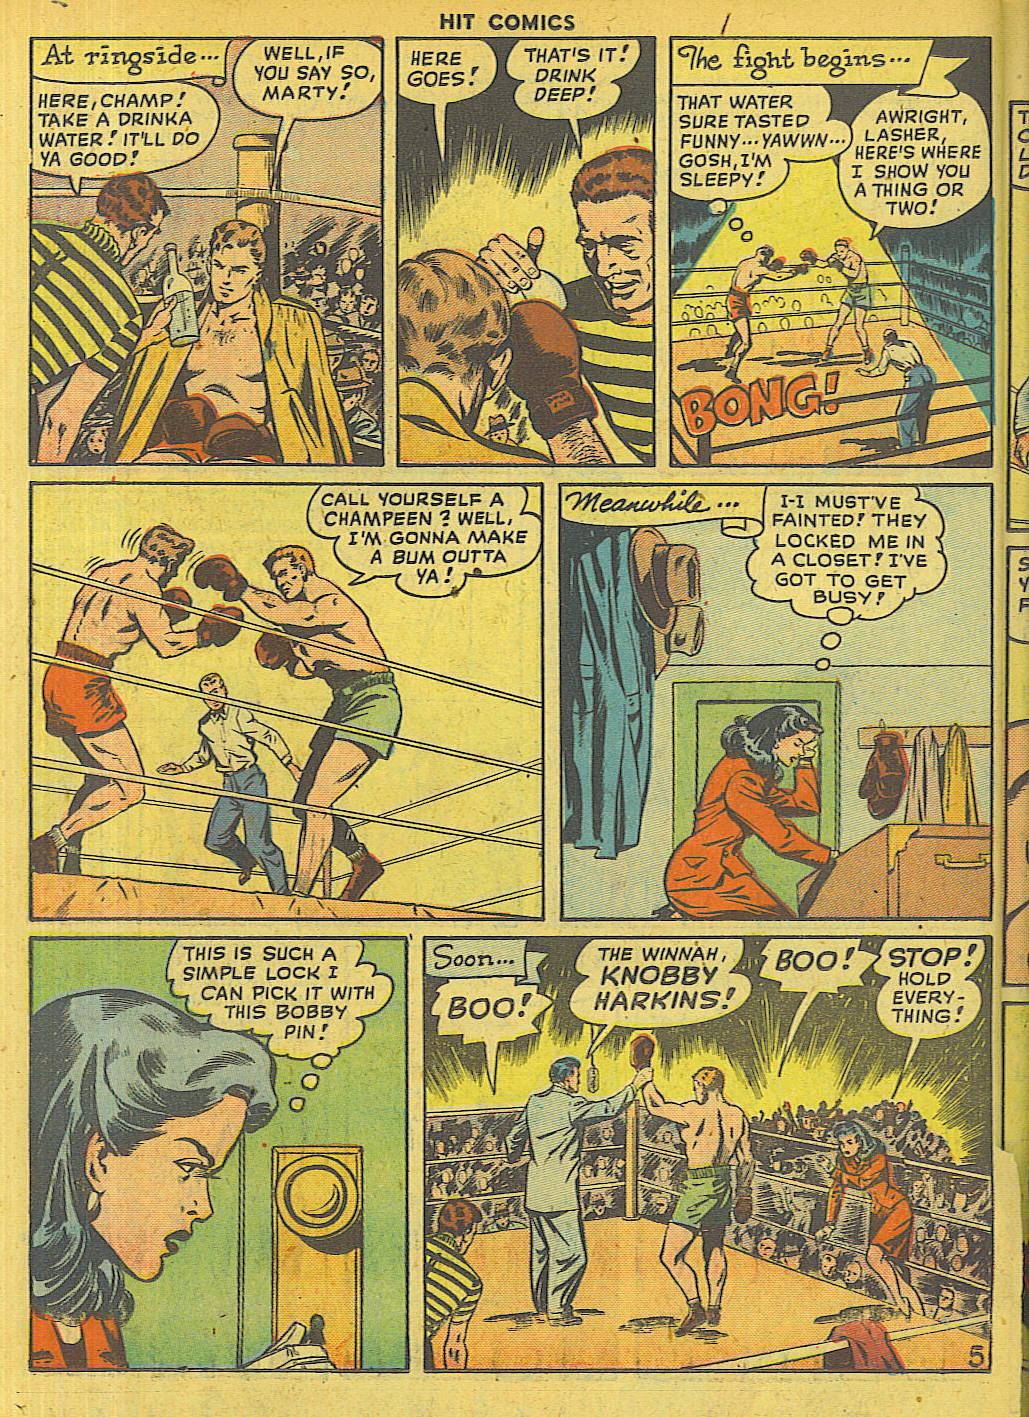 Read online Hit Comics comic -  Issue #56 - 36